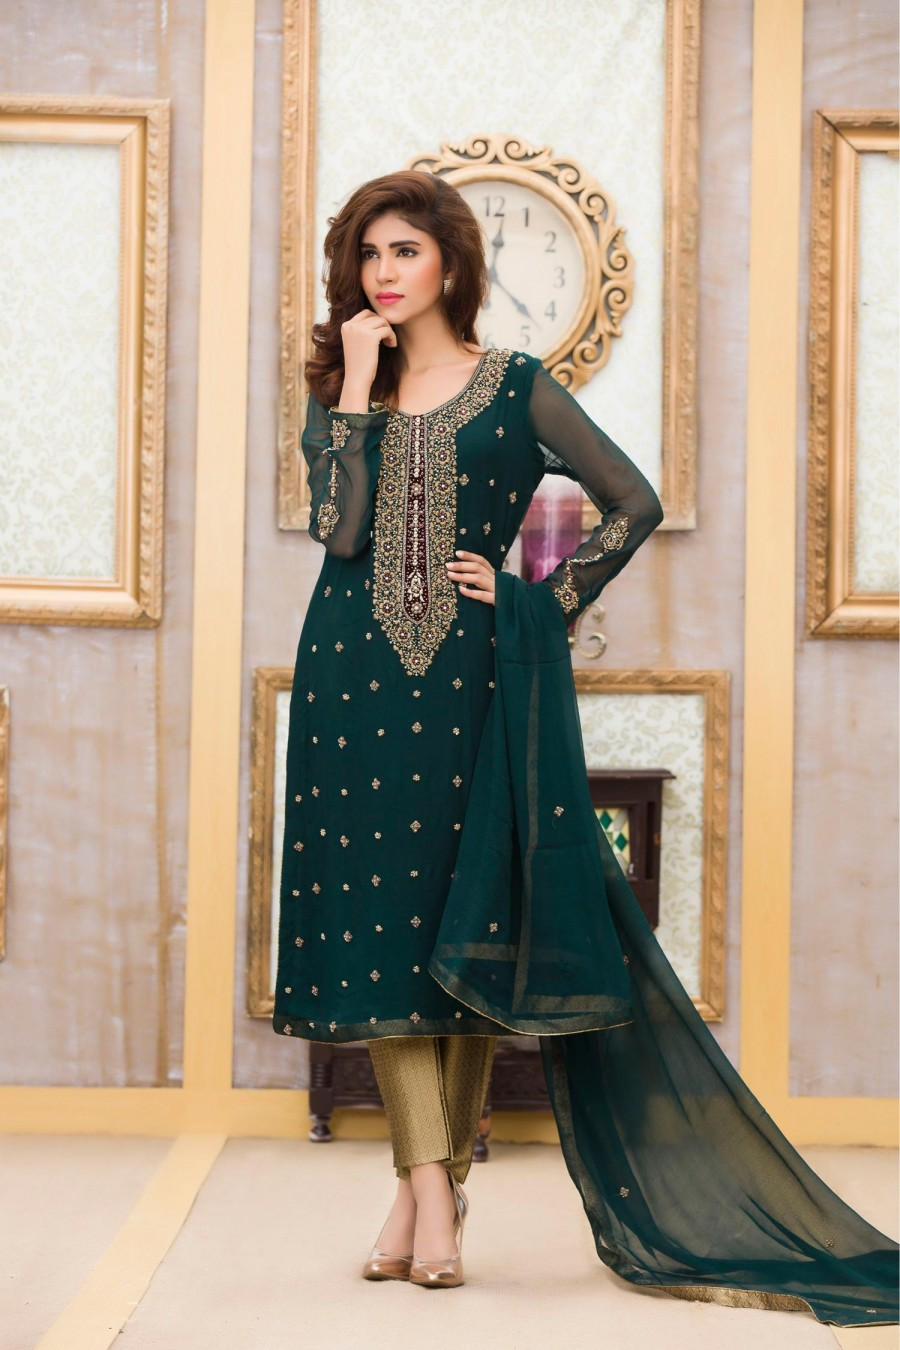 Exclusive Boutique Incredible Bottle Green Bridal Dress